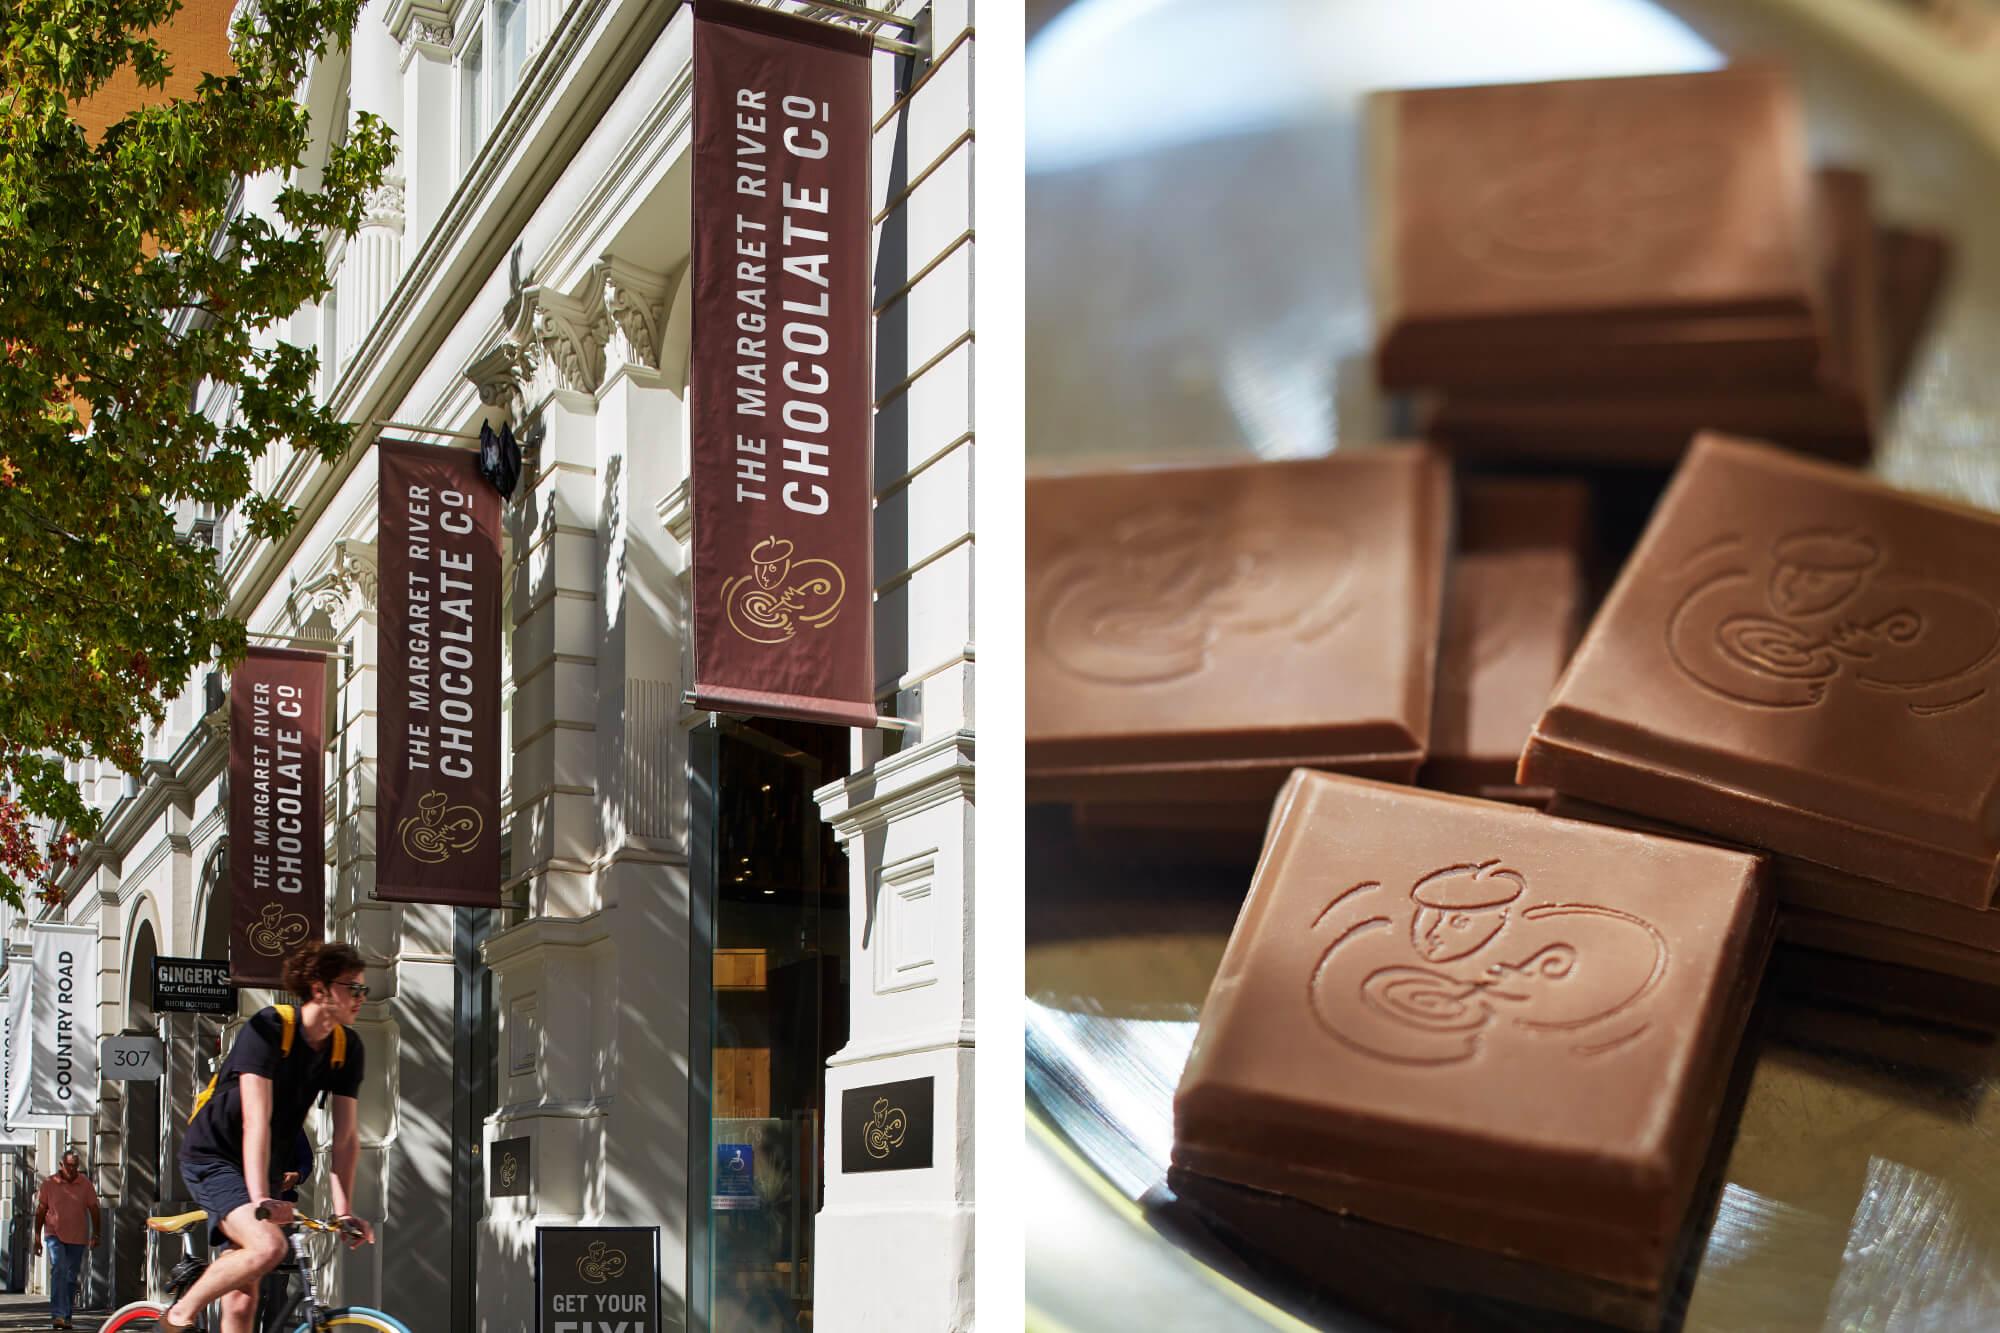 margaret_river_chocolate_company_shop_2